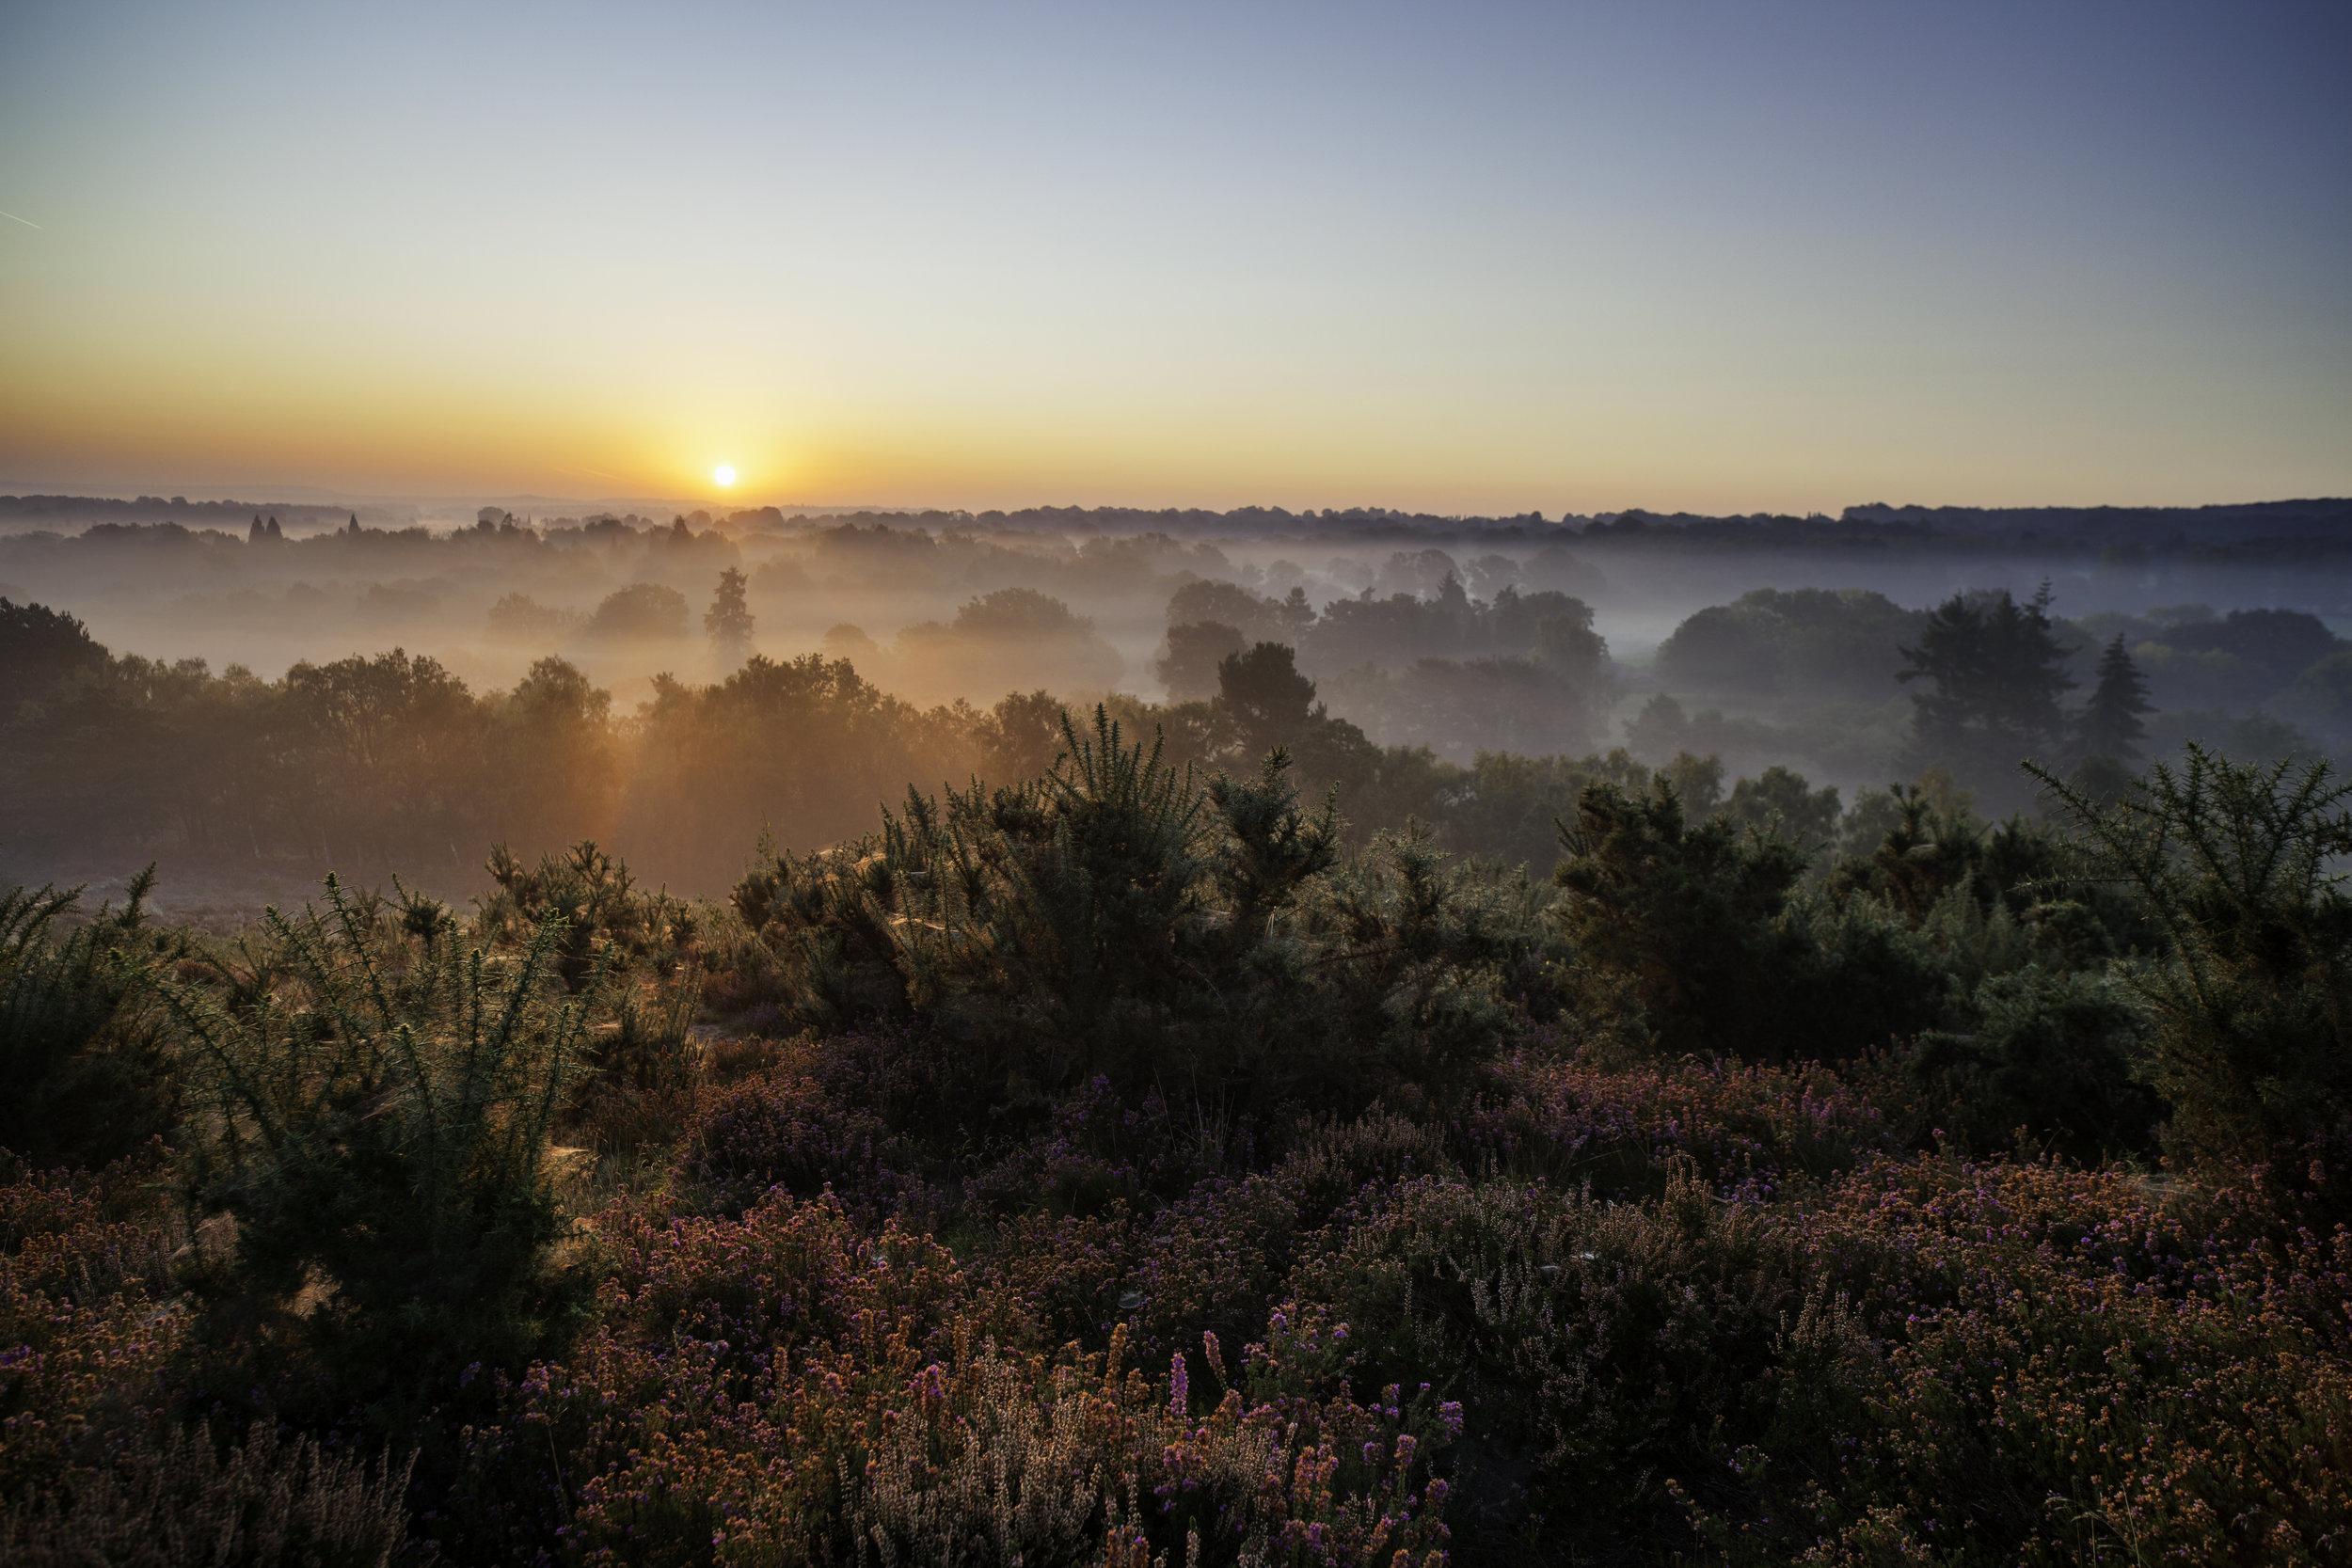 Surrey Hills, Image: iStock/simonbradfield